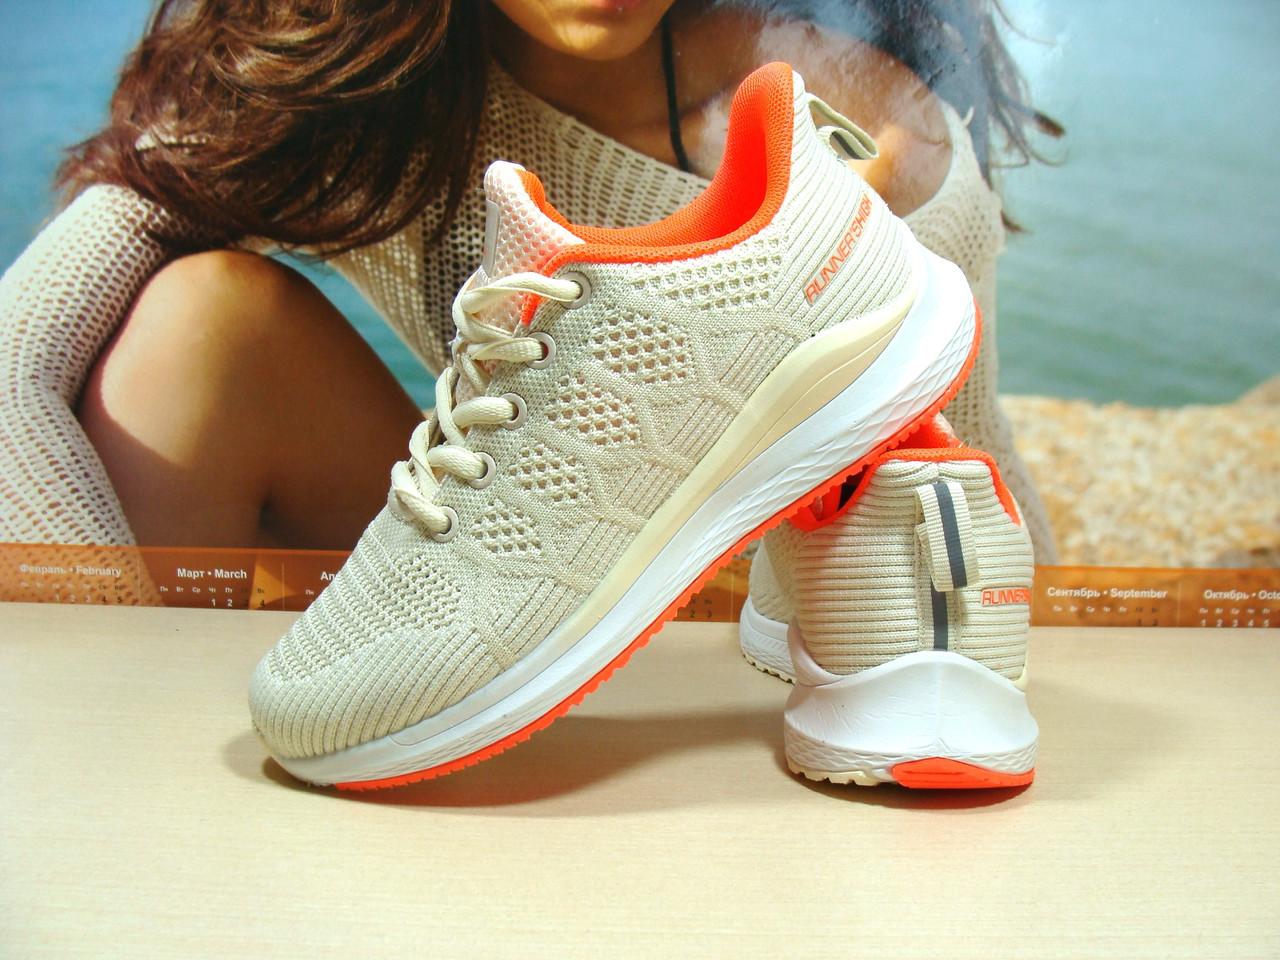 Женские кроссовки BaaS Runners бежевые 39 р.